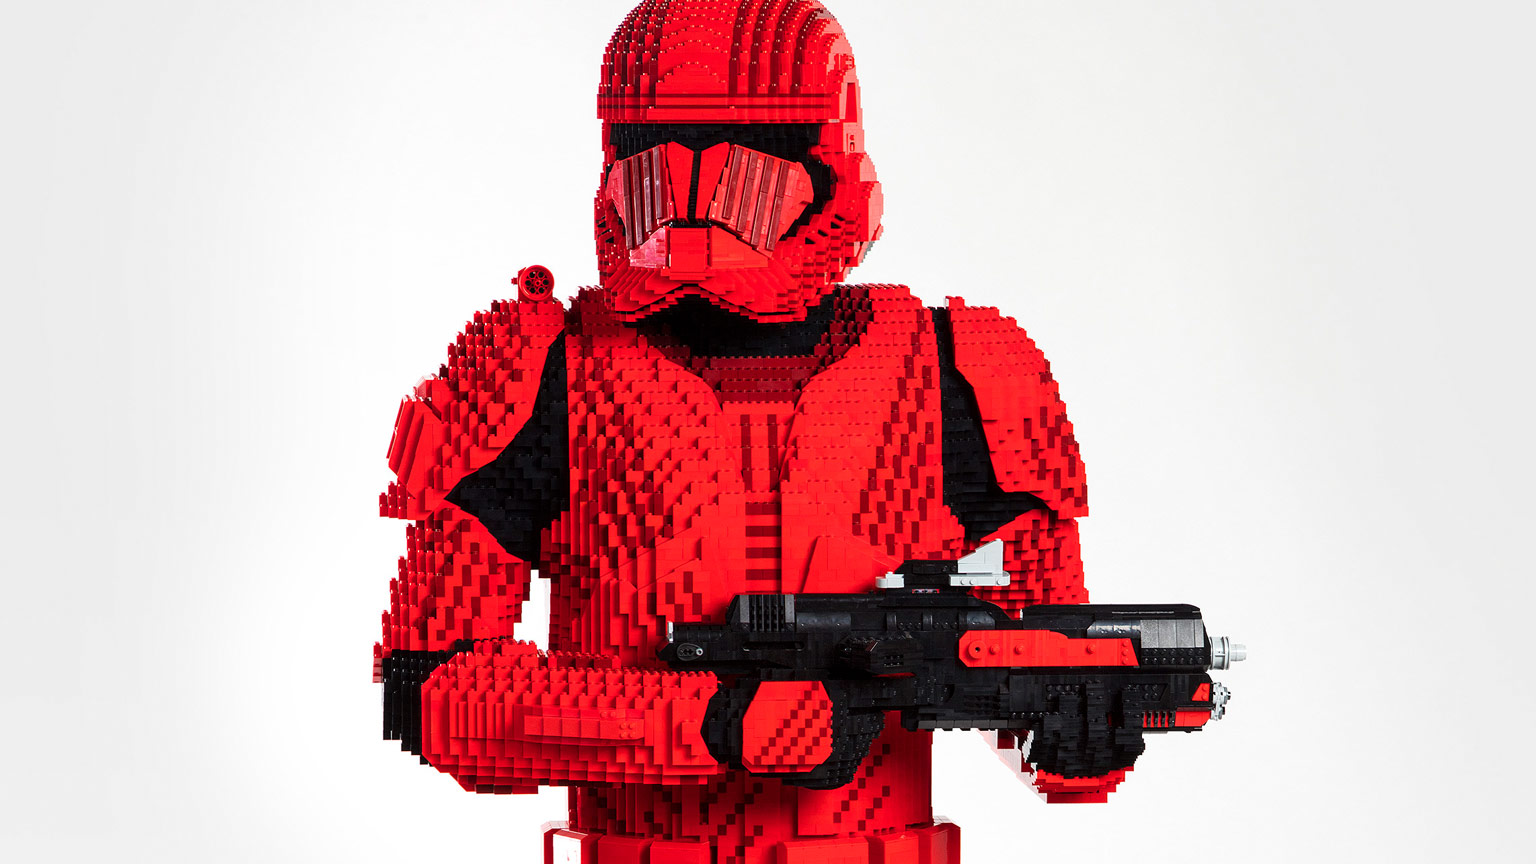 Lego Sith Trooper Tall